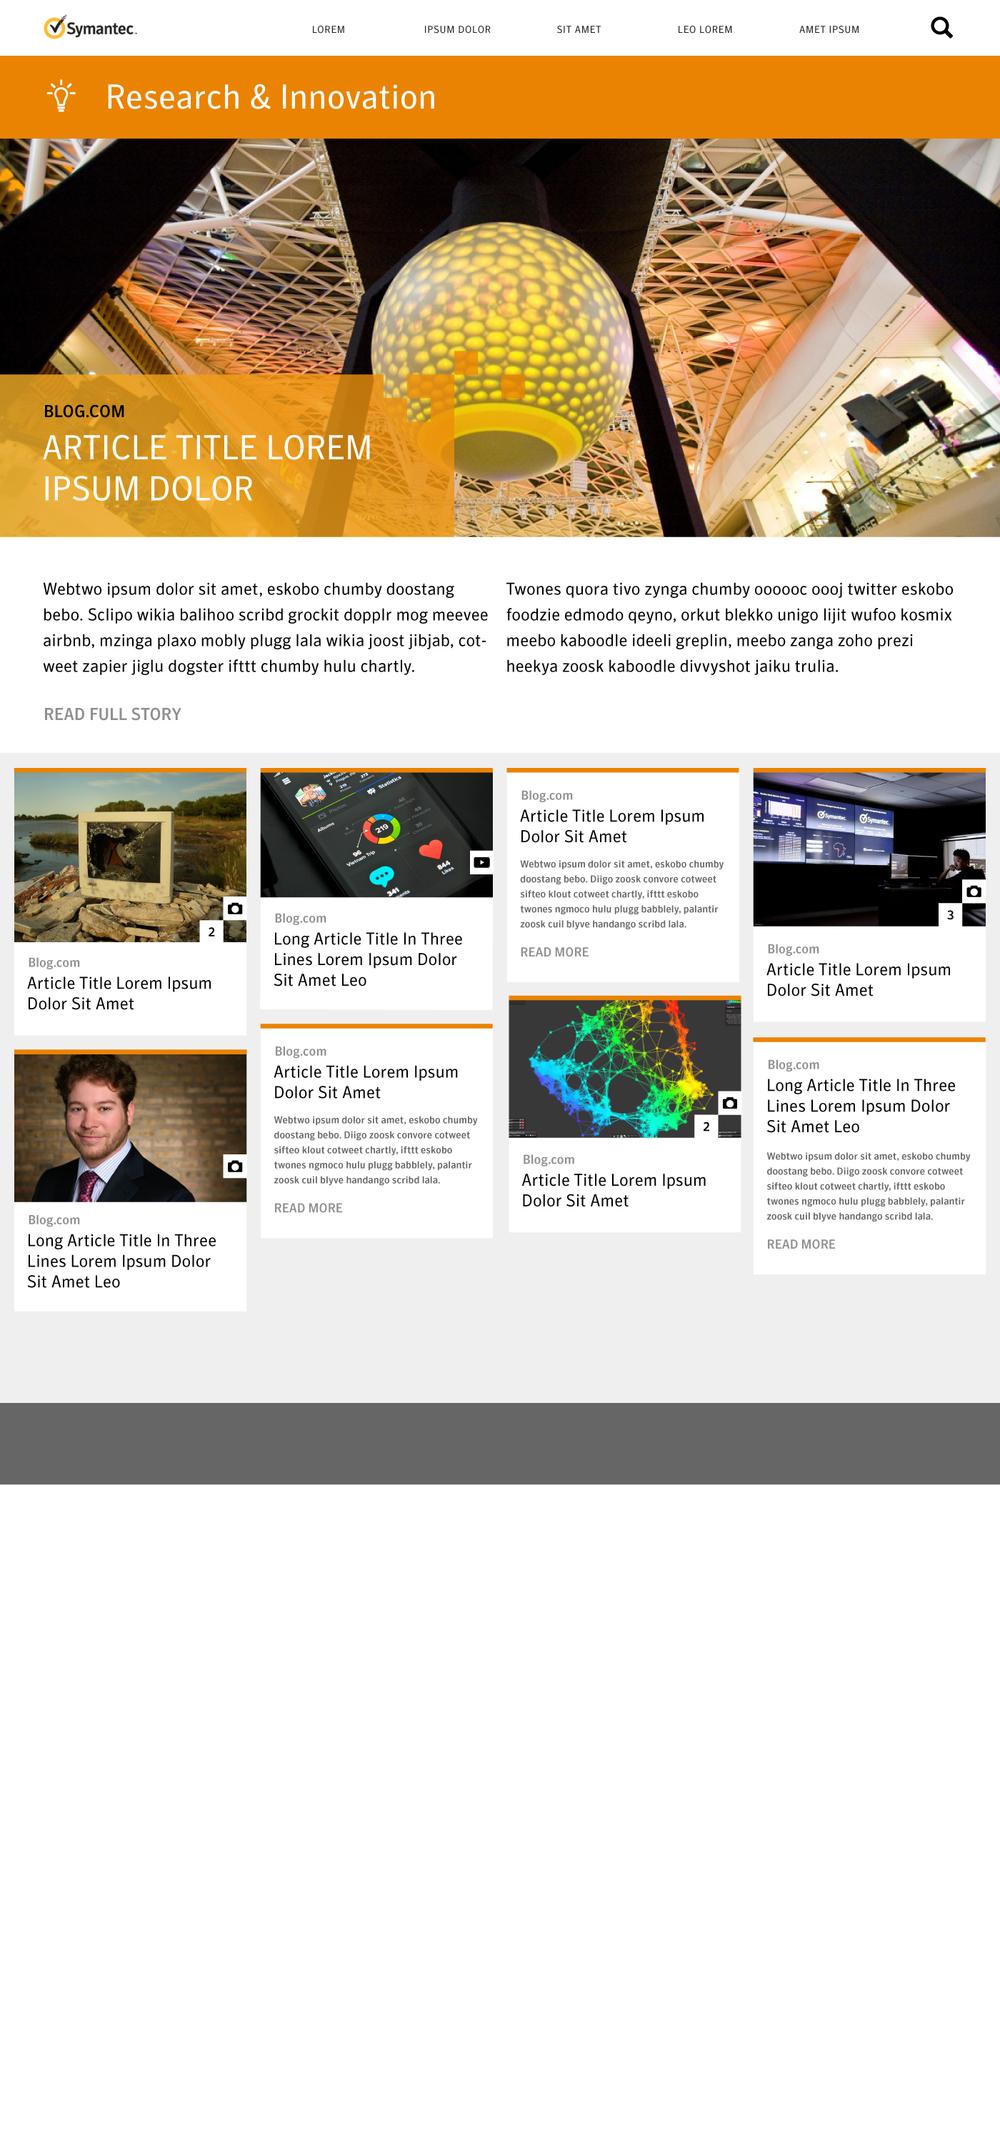 Symantec_Newsroom_01_03.jpg